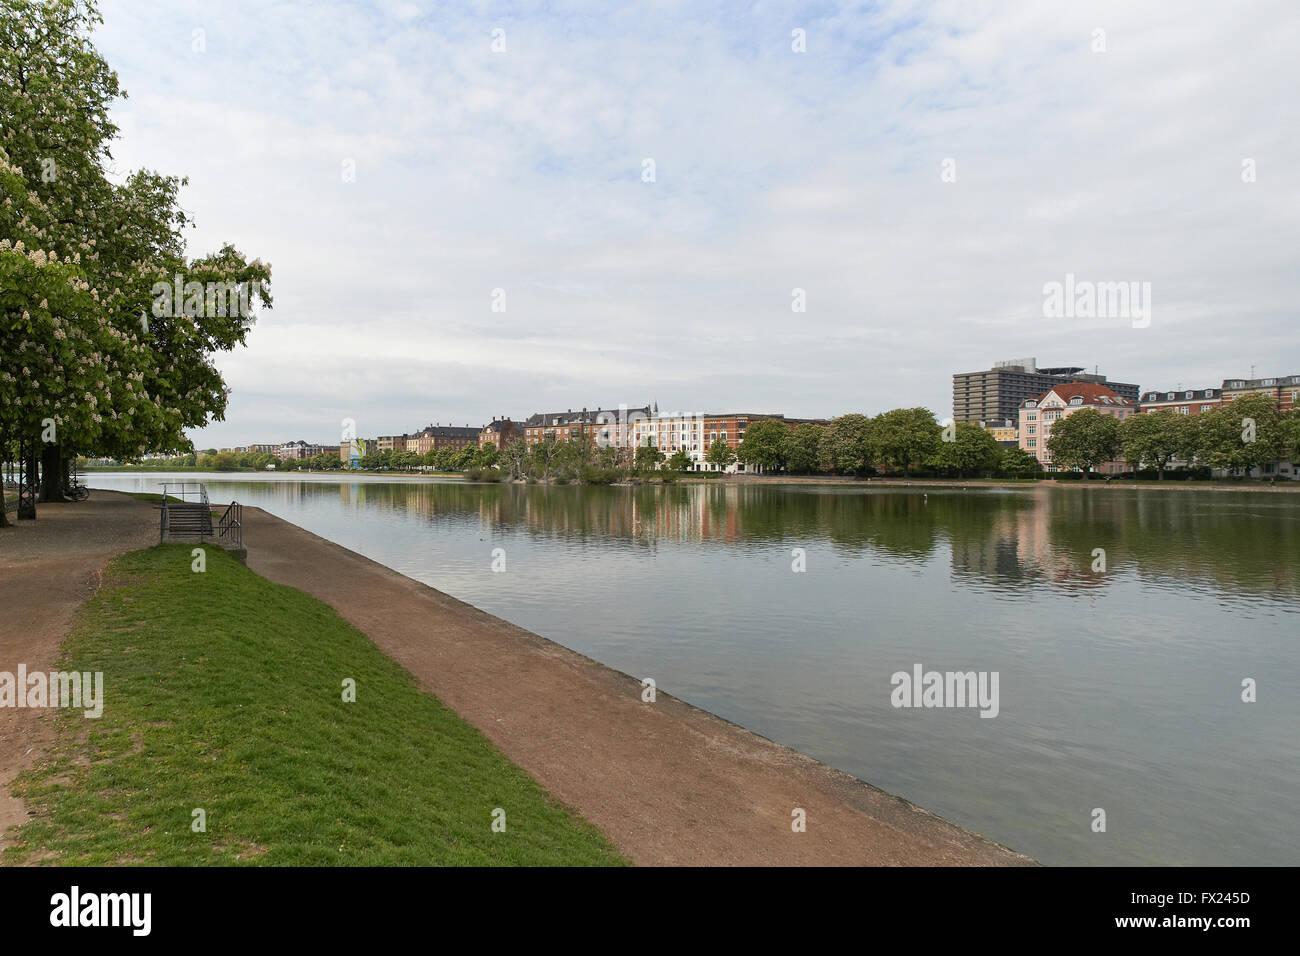 Sortedams lake located in Copenhagen, Denmark - Stock Image